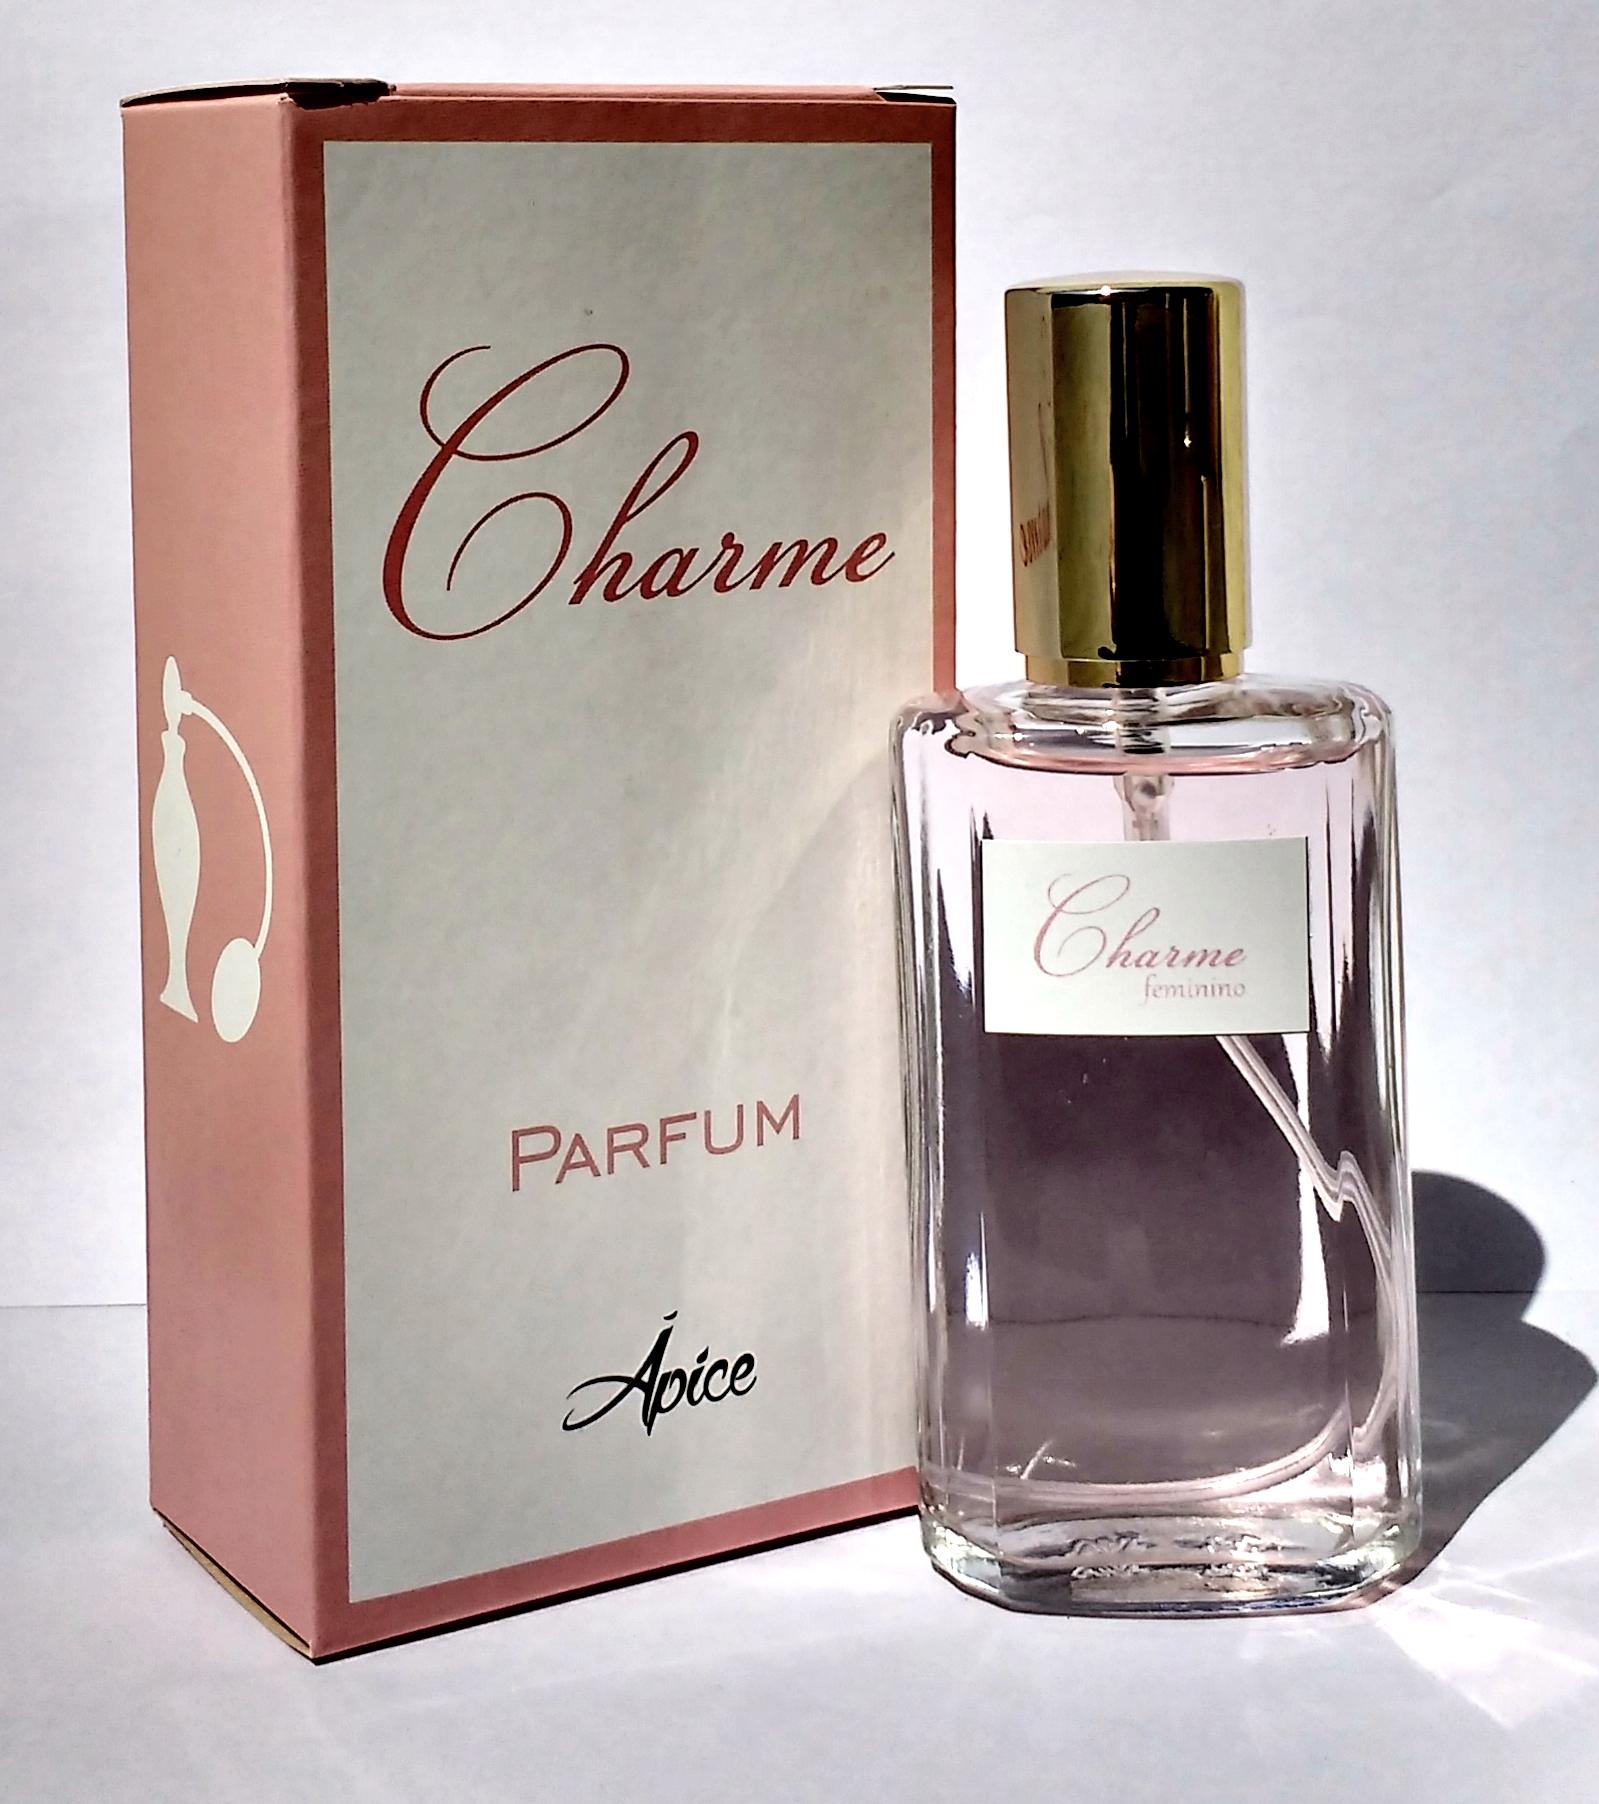 01e1536bbff Perfume Chance Eau Fraiche Feminino Contratipo 100ml no Elo7